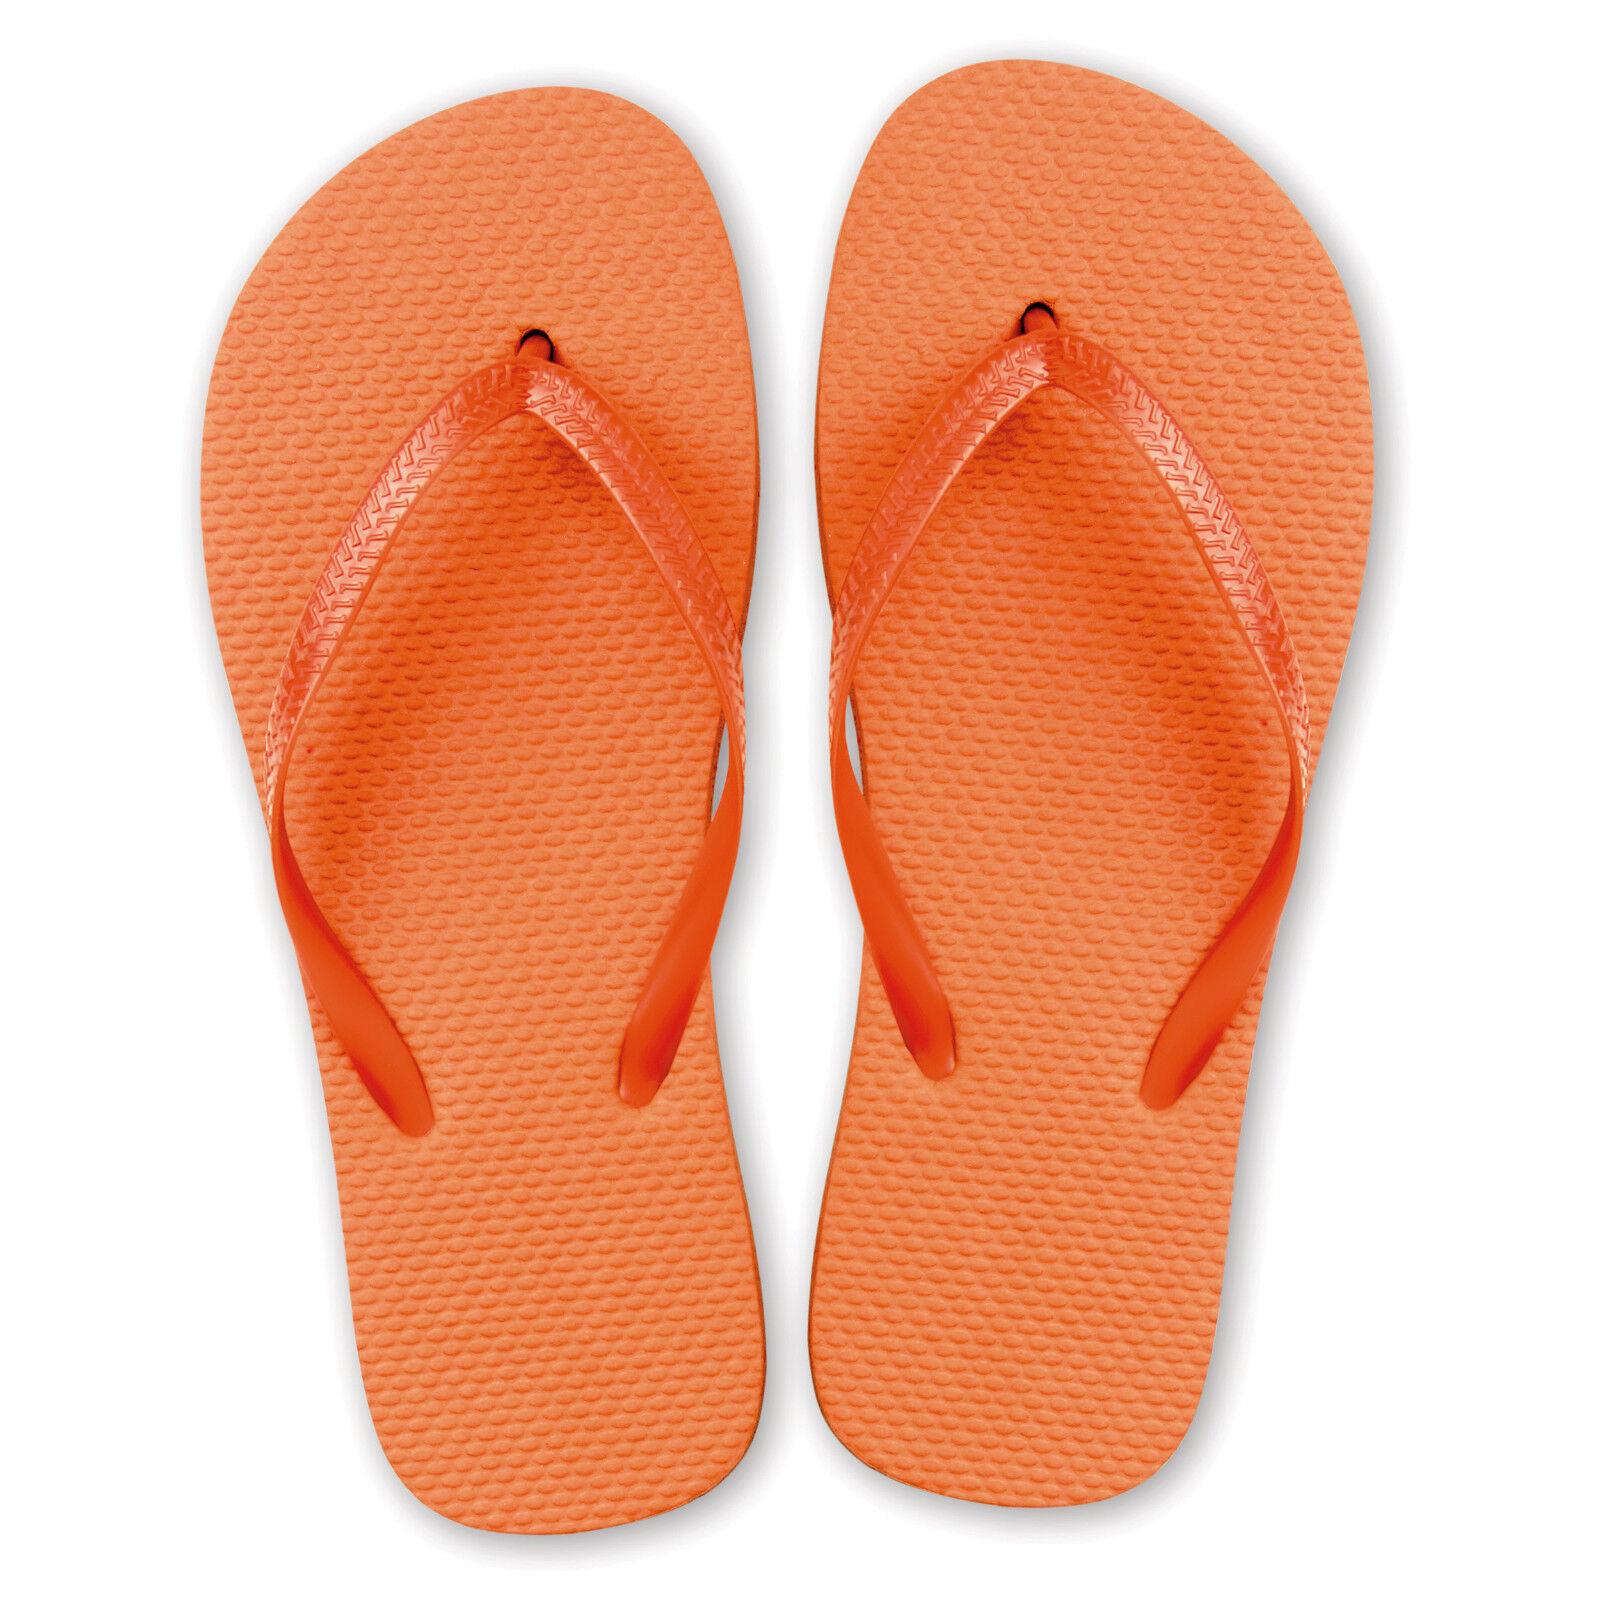 10 Pairs Pairs Pairs of Ladies Flip Flops Wedding Party Favour SPA Sandals M L (size 6 9) e9930f